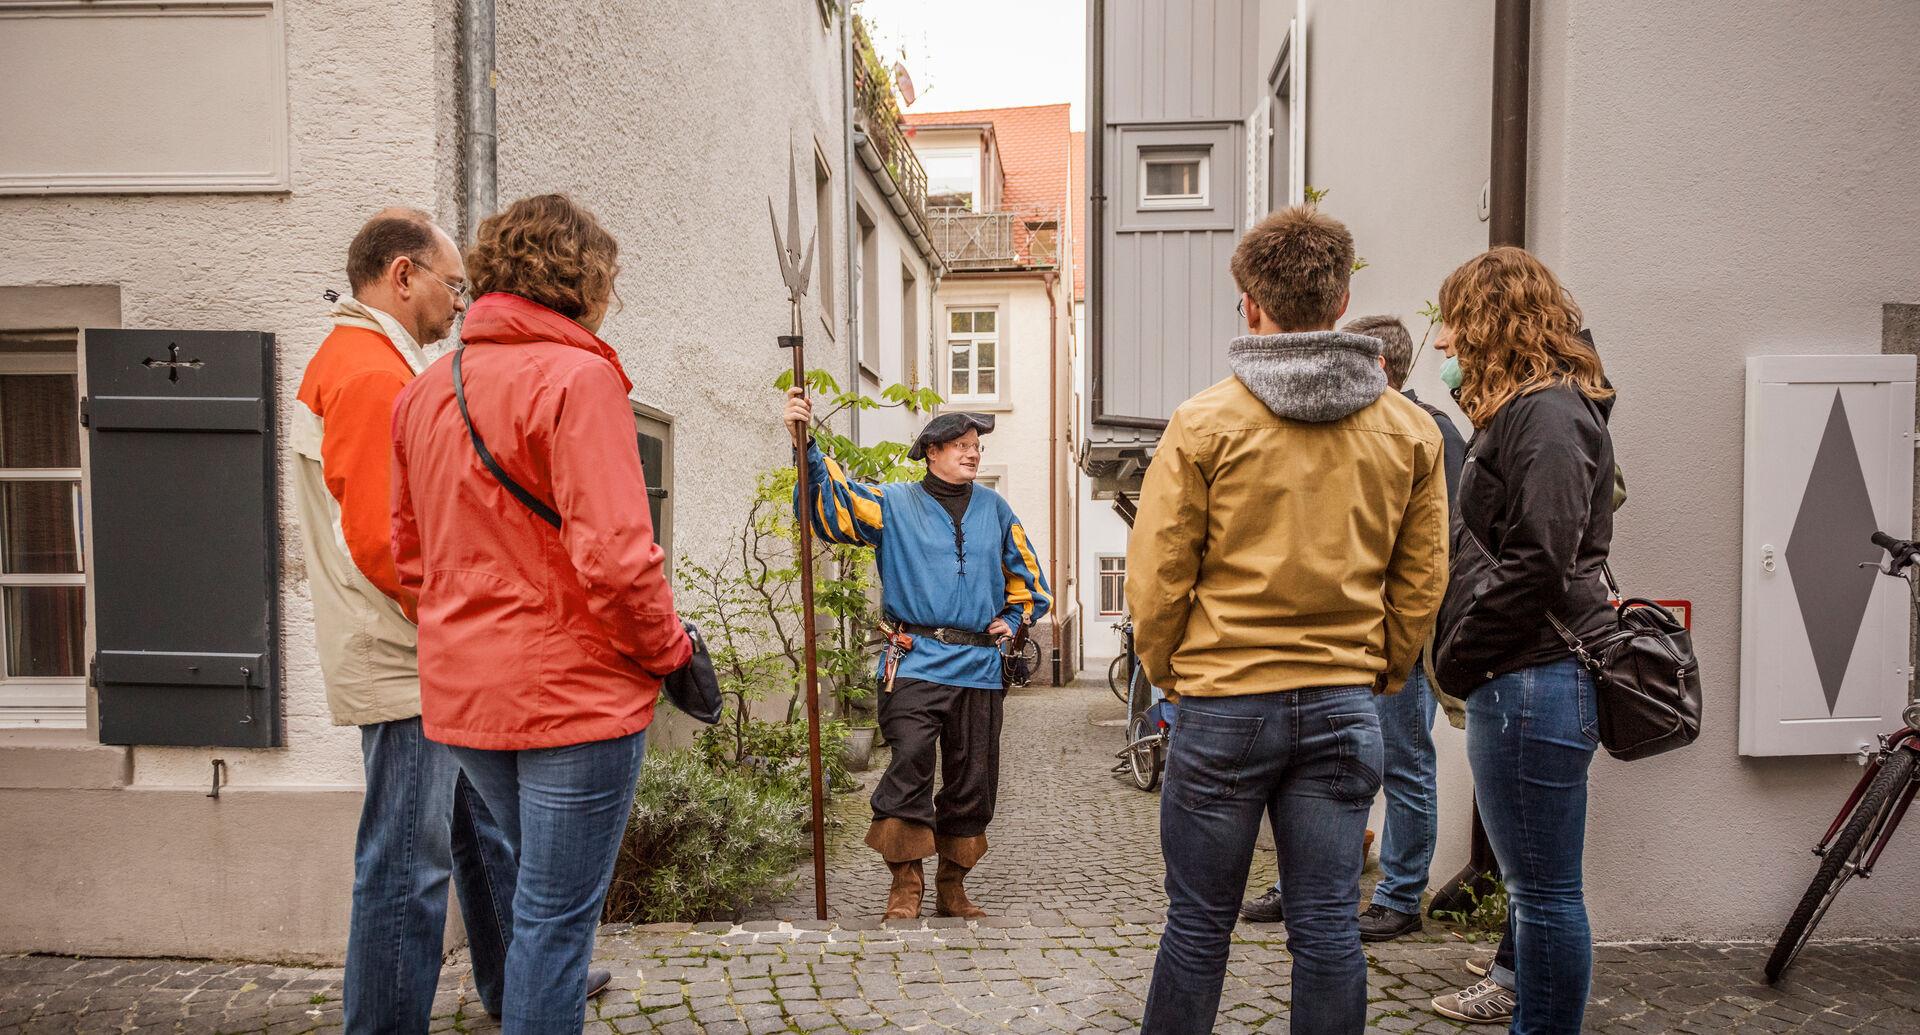 Konstanz-Stadtfuehrung-Landsknecht-01_Fruehling_Copyright_MTK-Dagmar-Schwelle